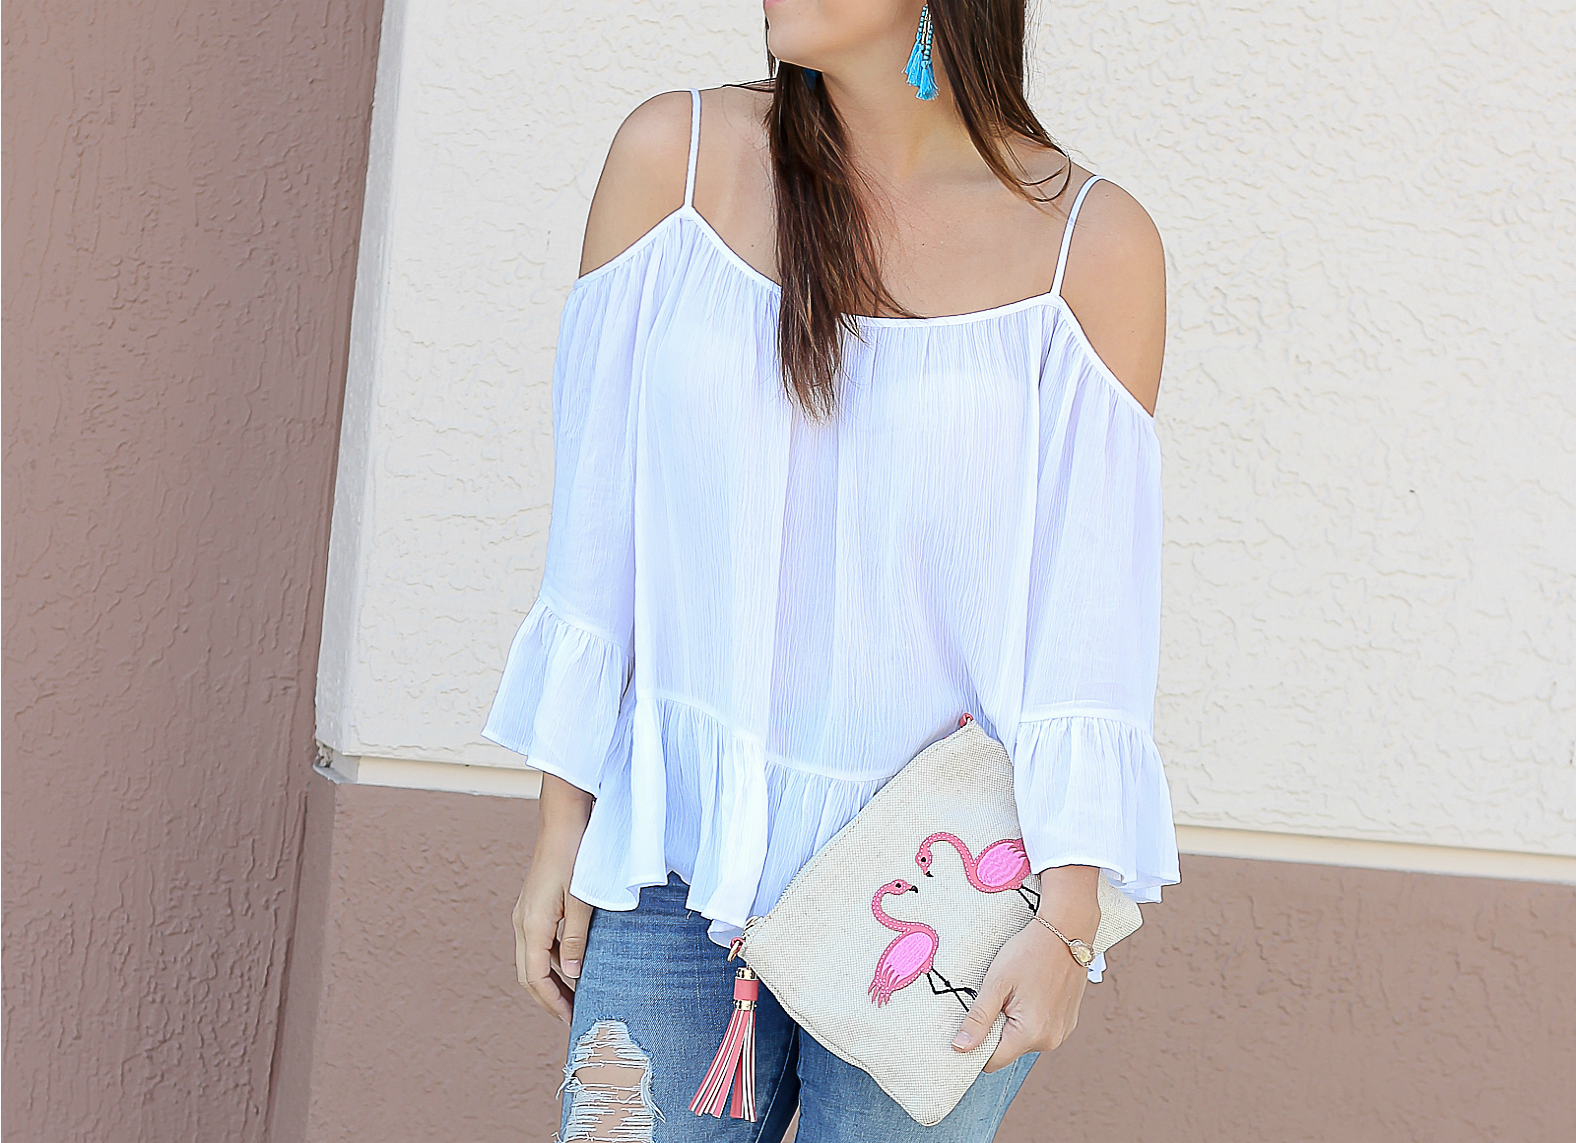 flamingo clutch, Francescas flamingo clutch, best white off shoulder top